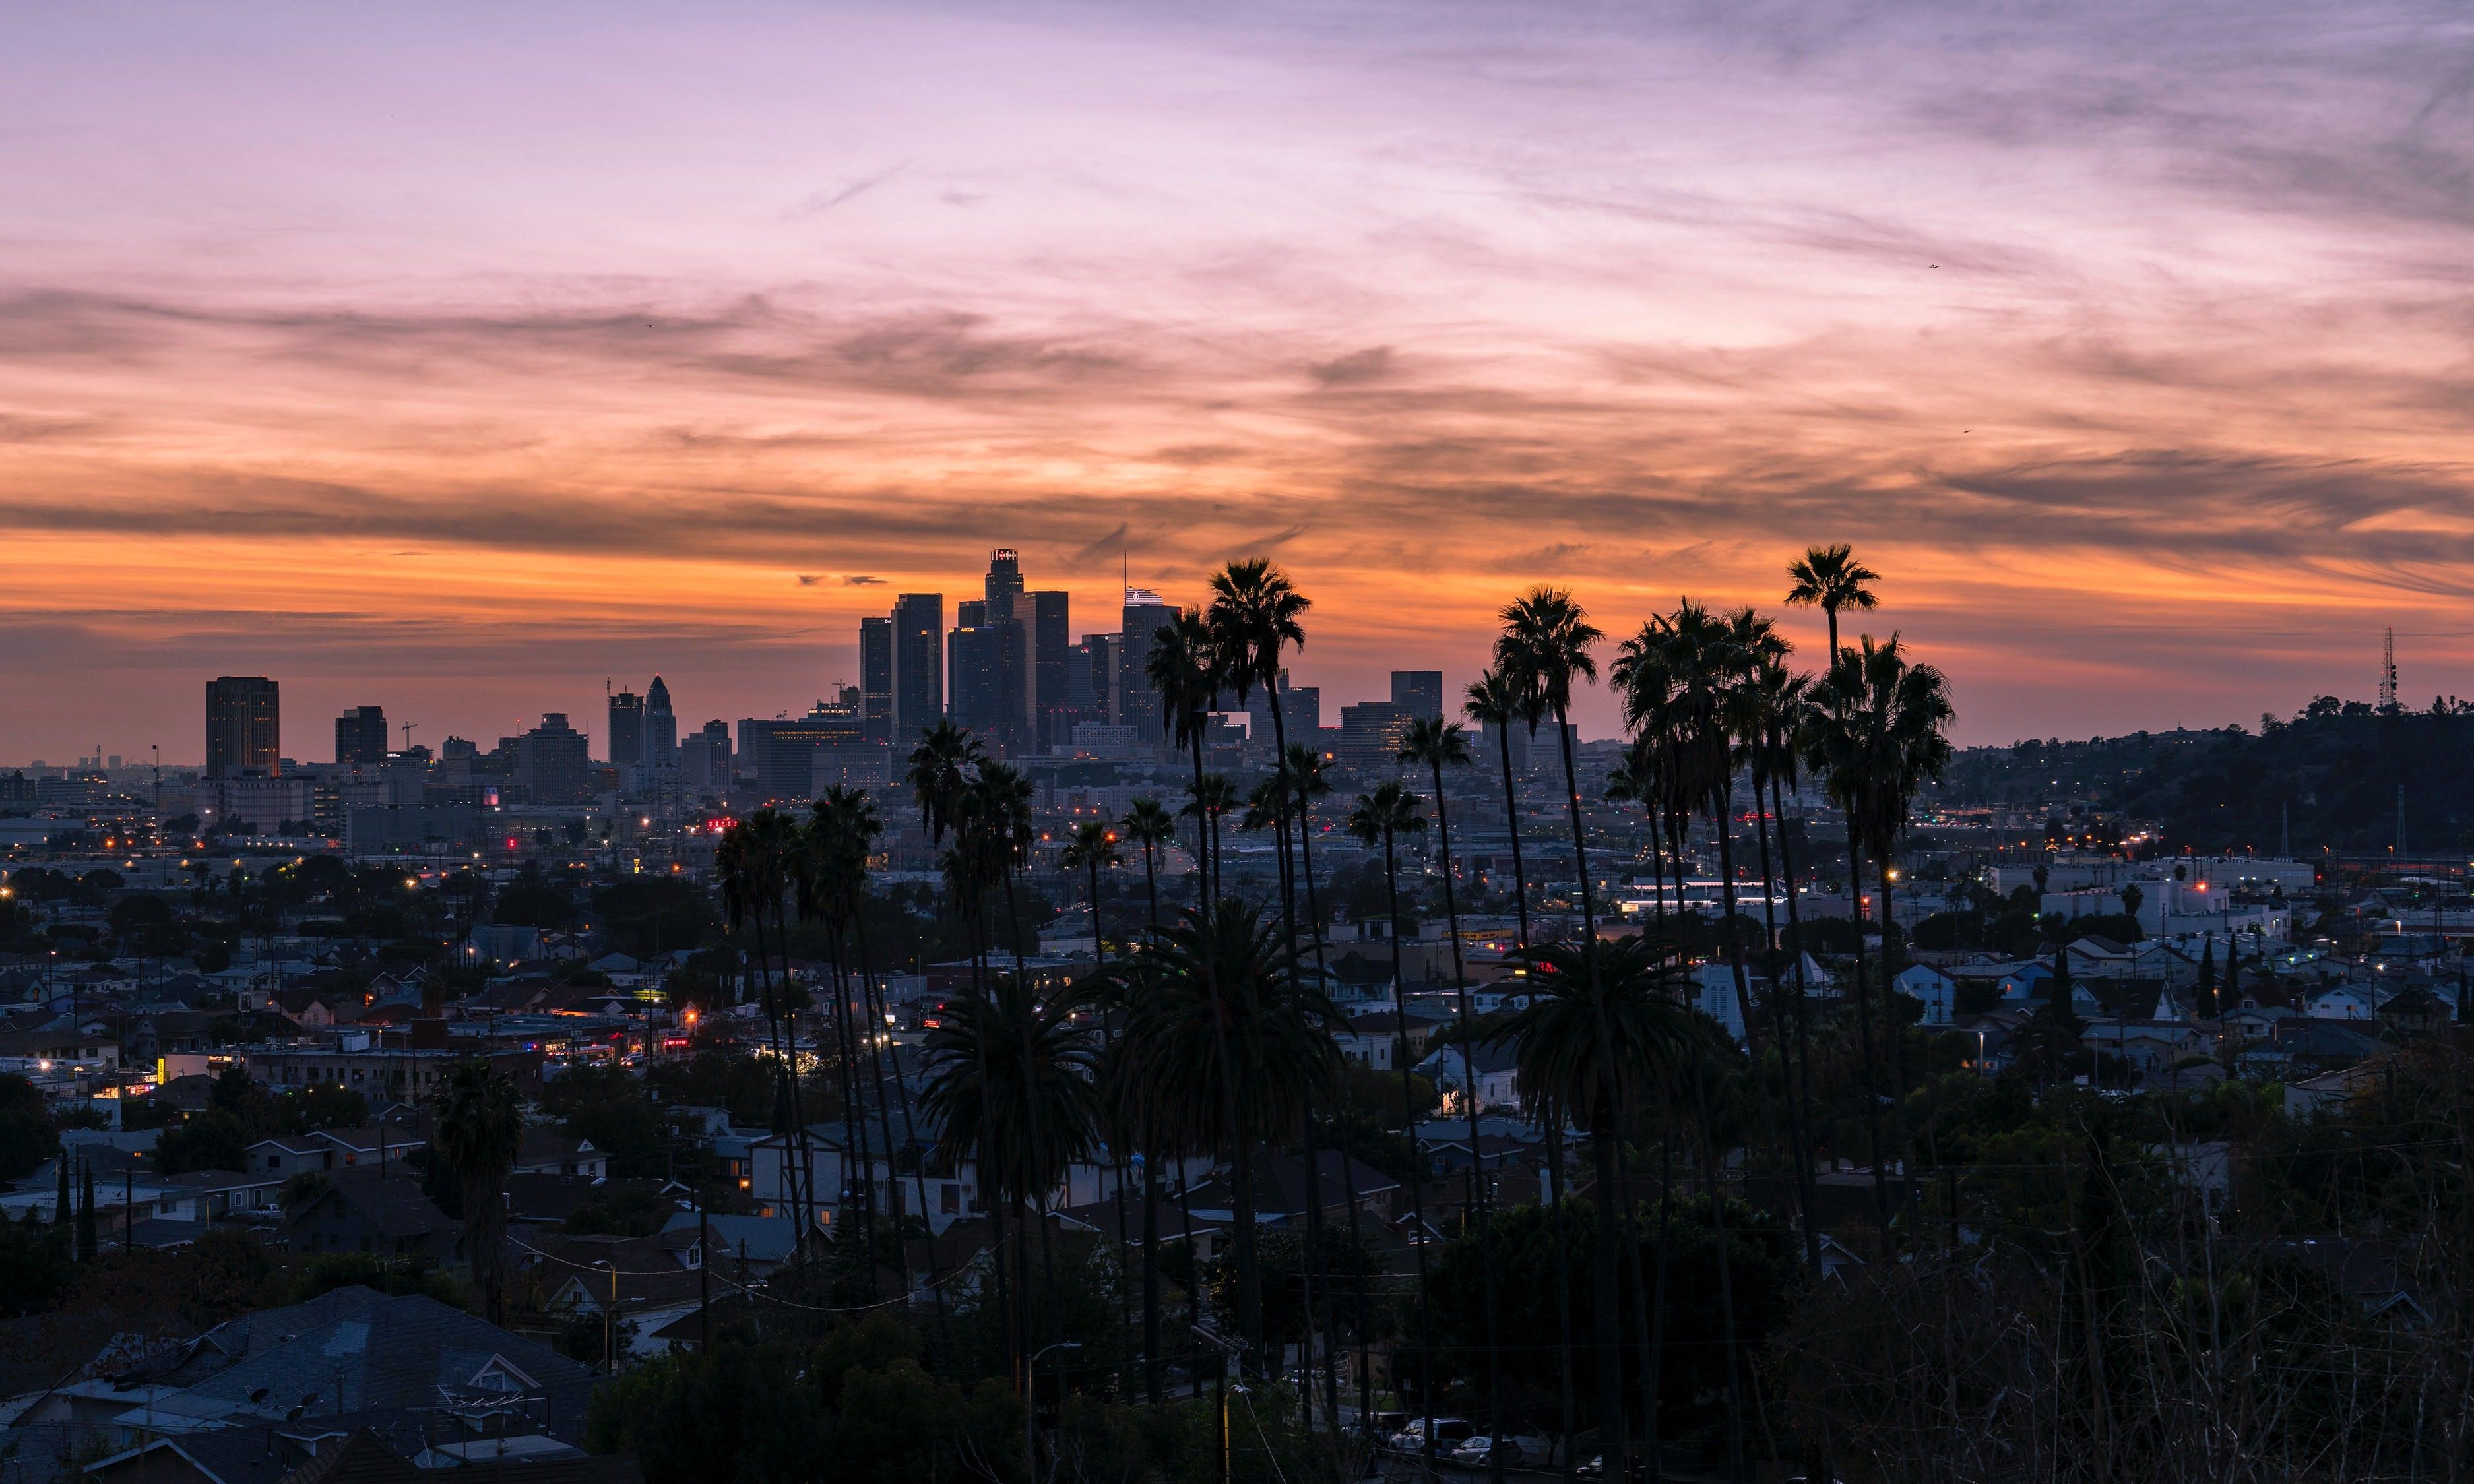 LA skyline at sunset